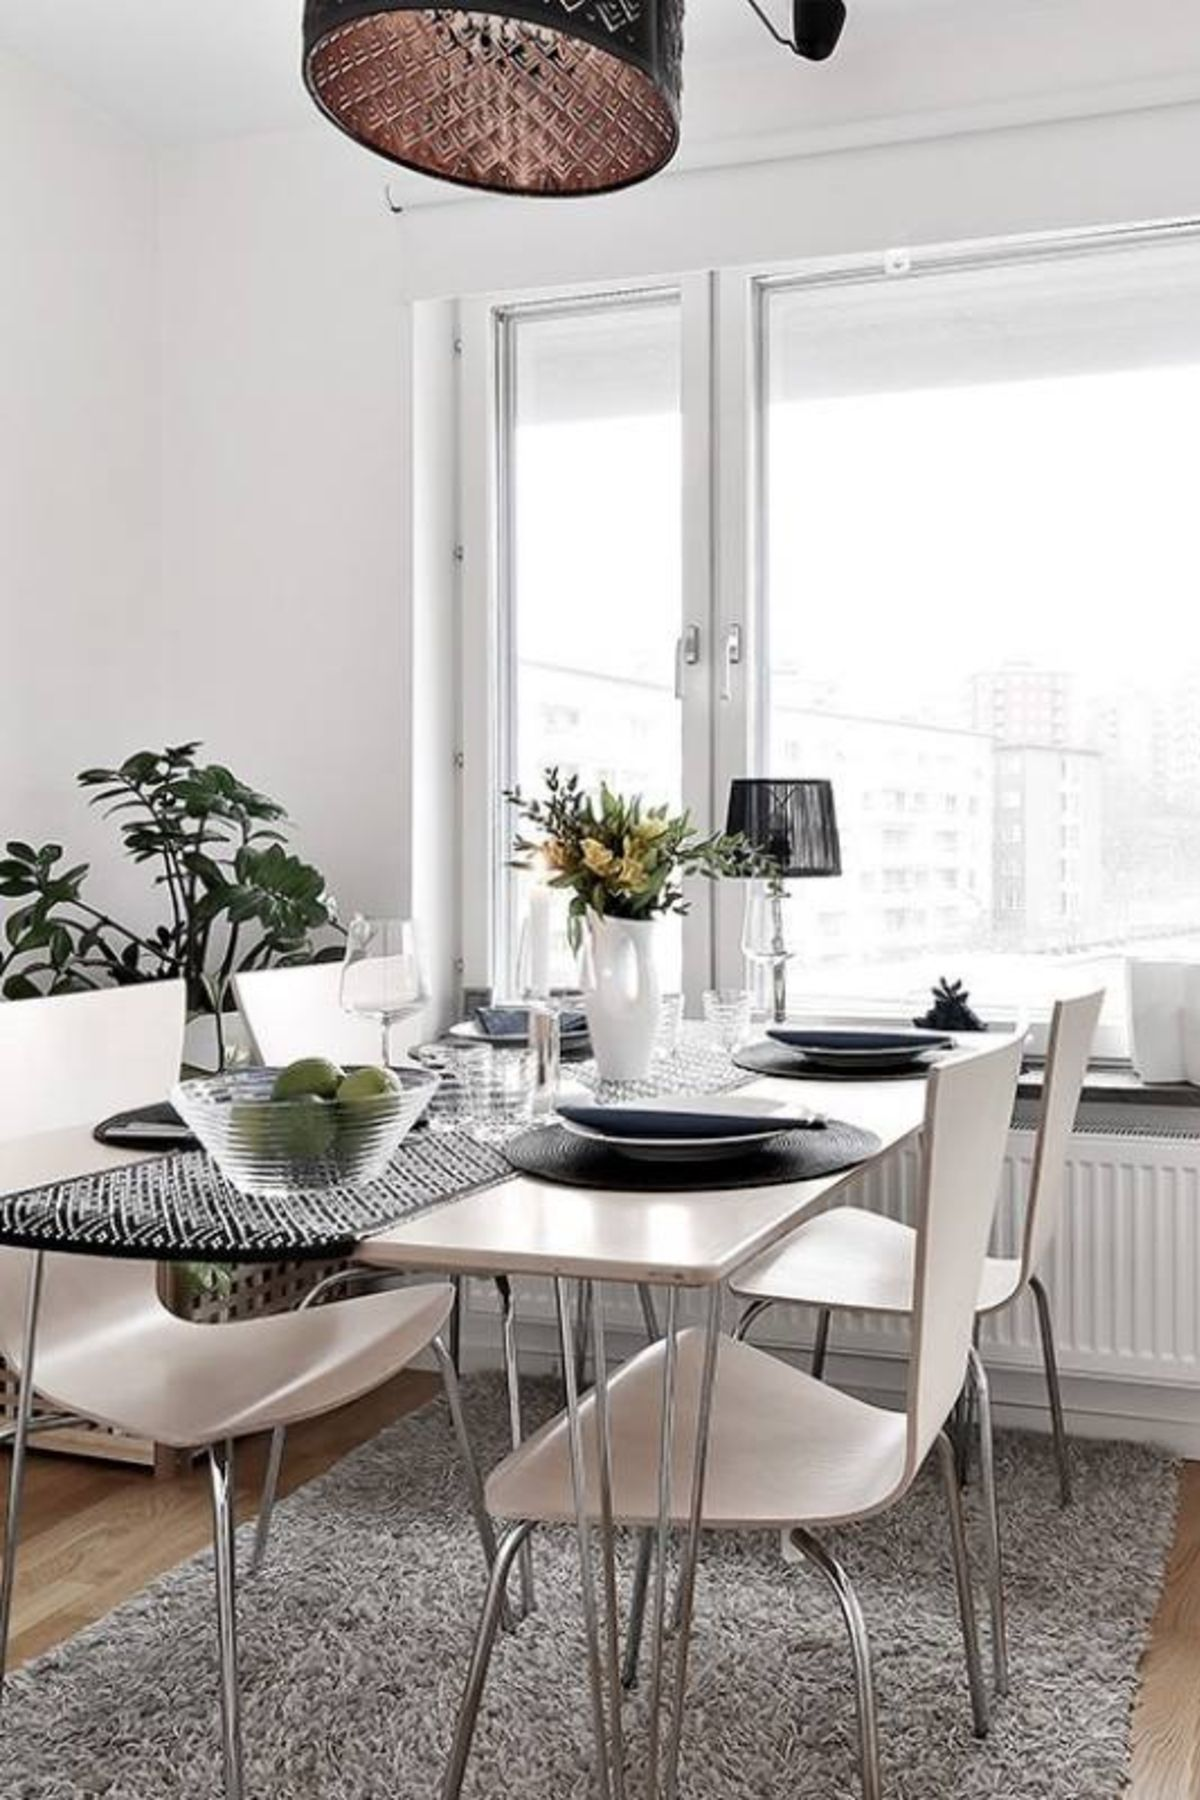 51 Scandinavian Stylish Dining Room Decor Ideas Minimalist Dining Room Dining Room Design Chic Dining Room